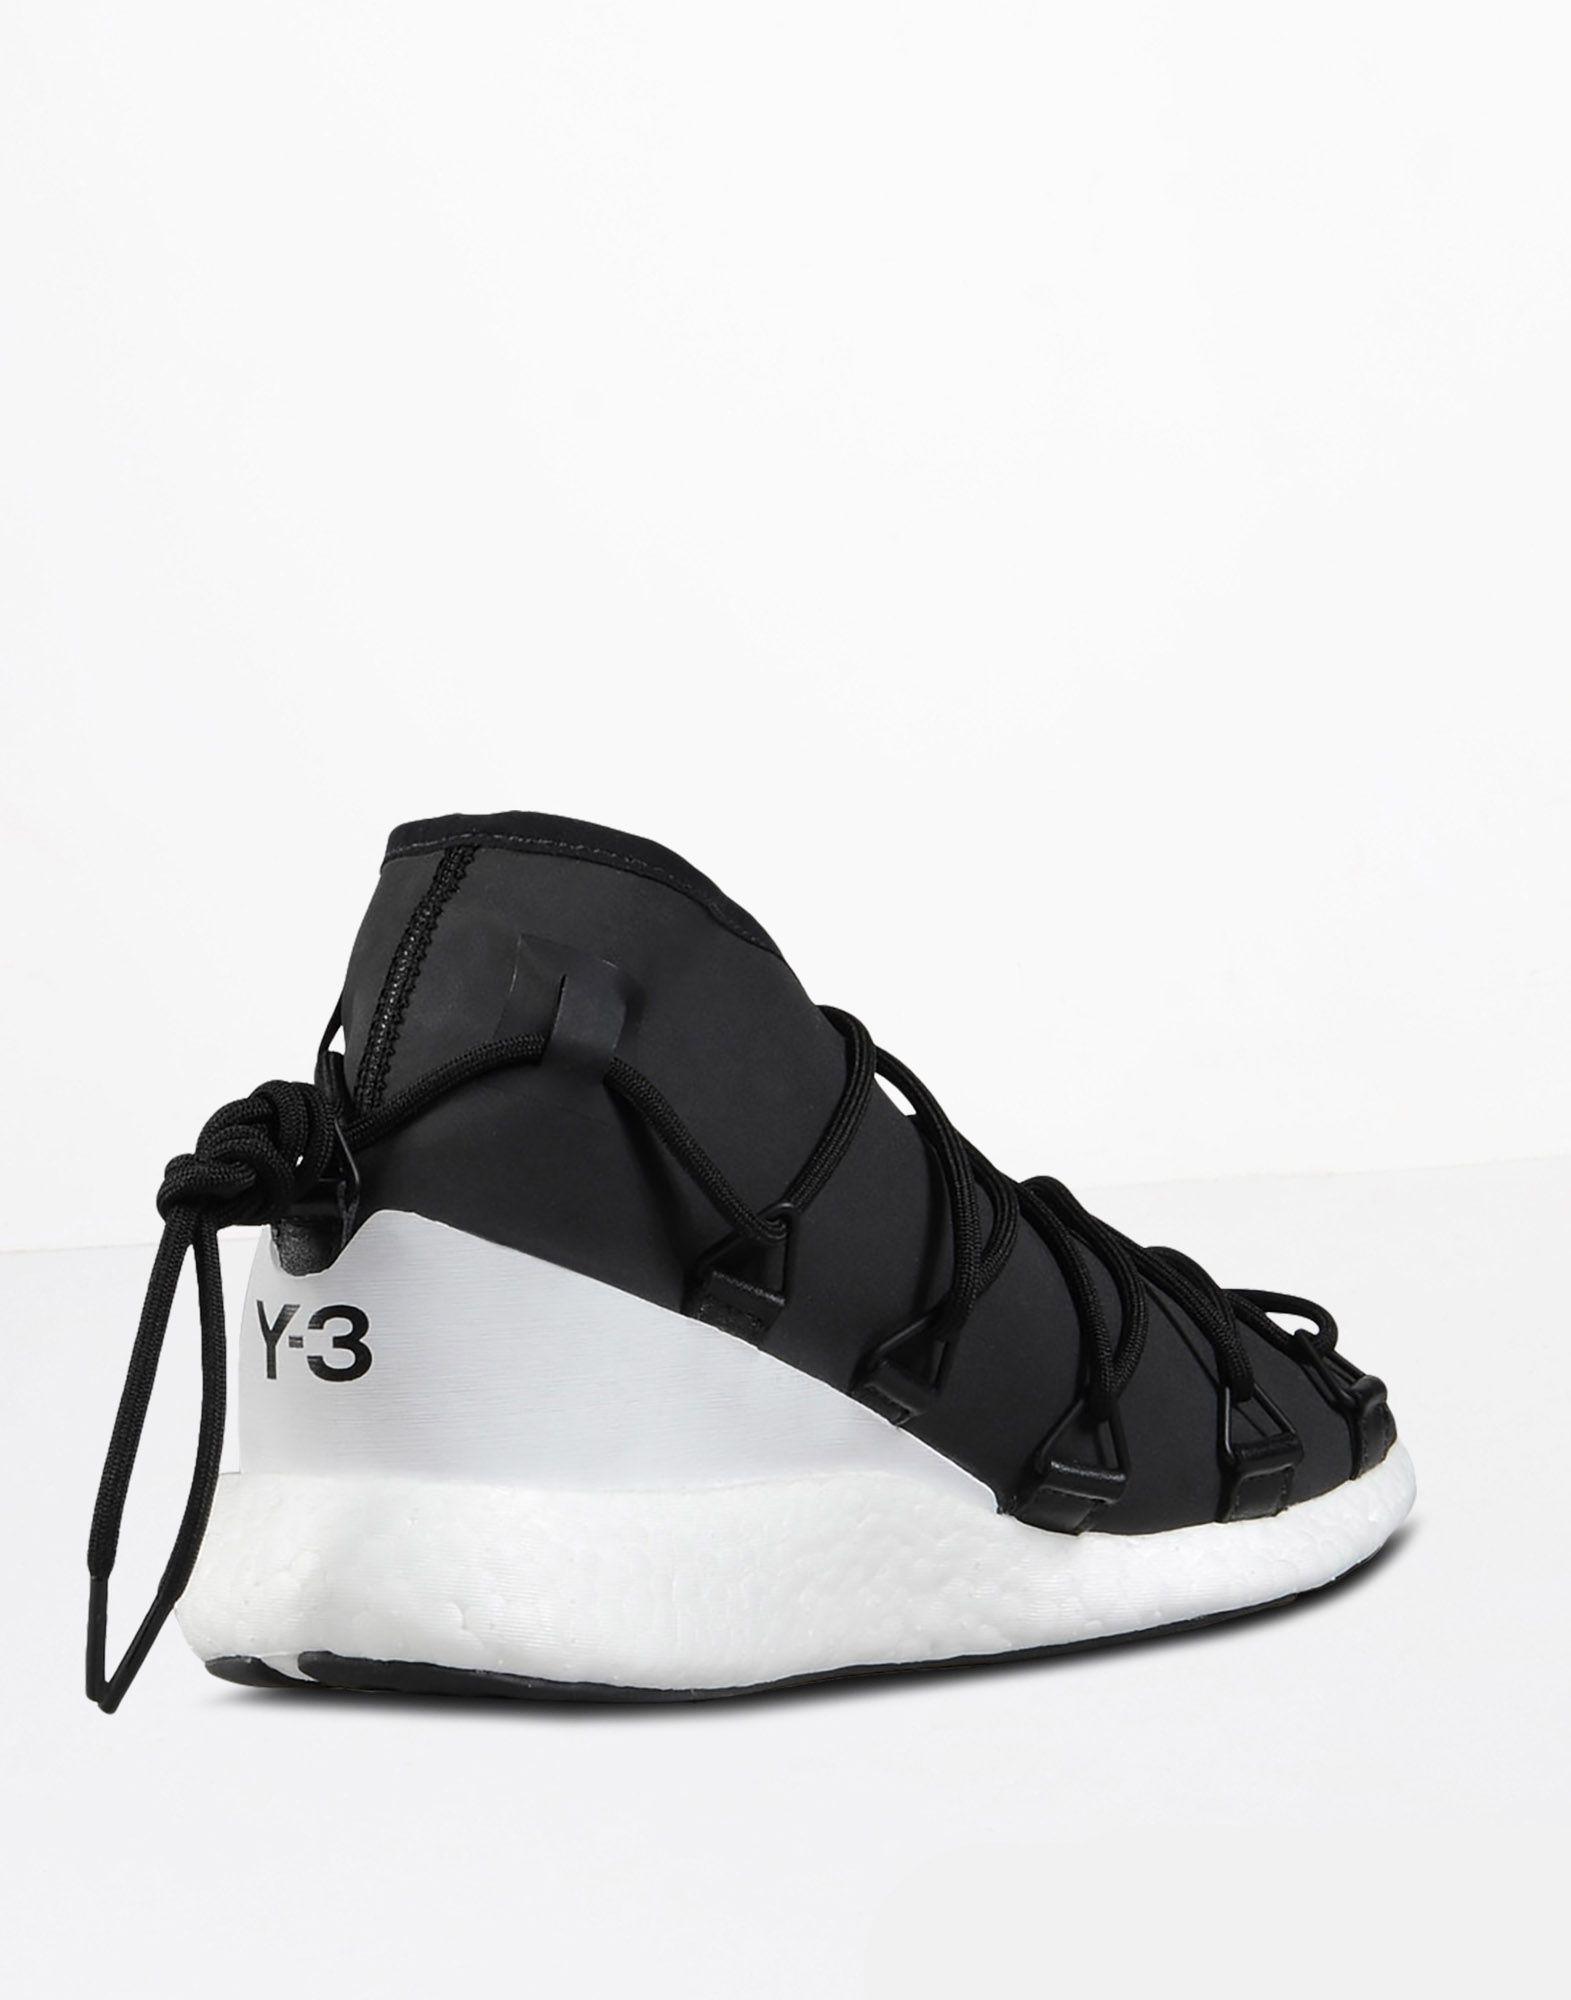 Acquista scarpa adidas y3 donna  a99453f634c